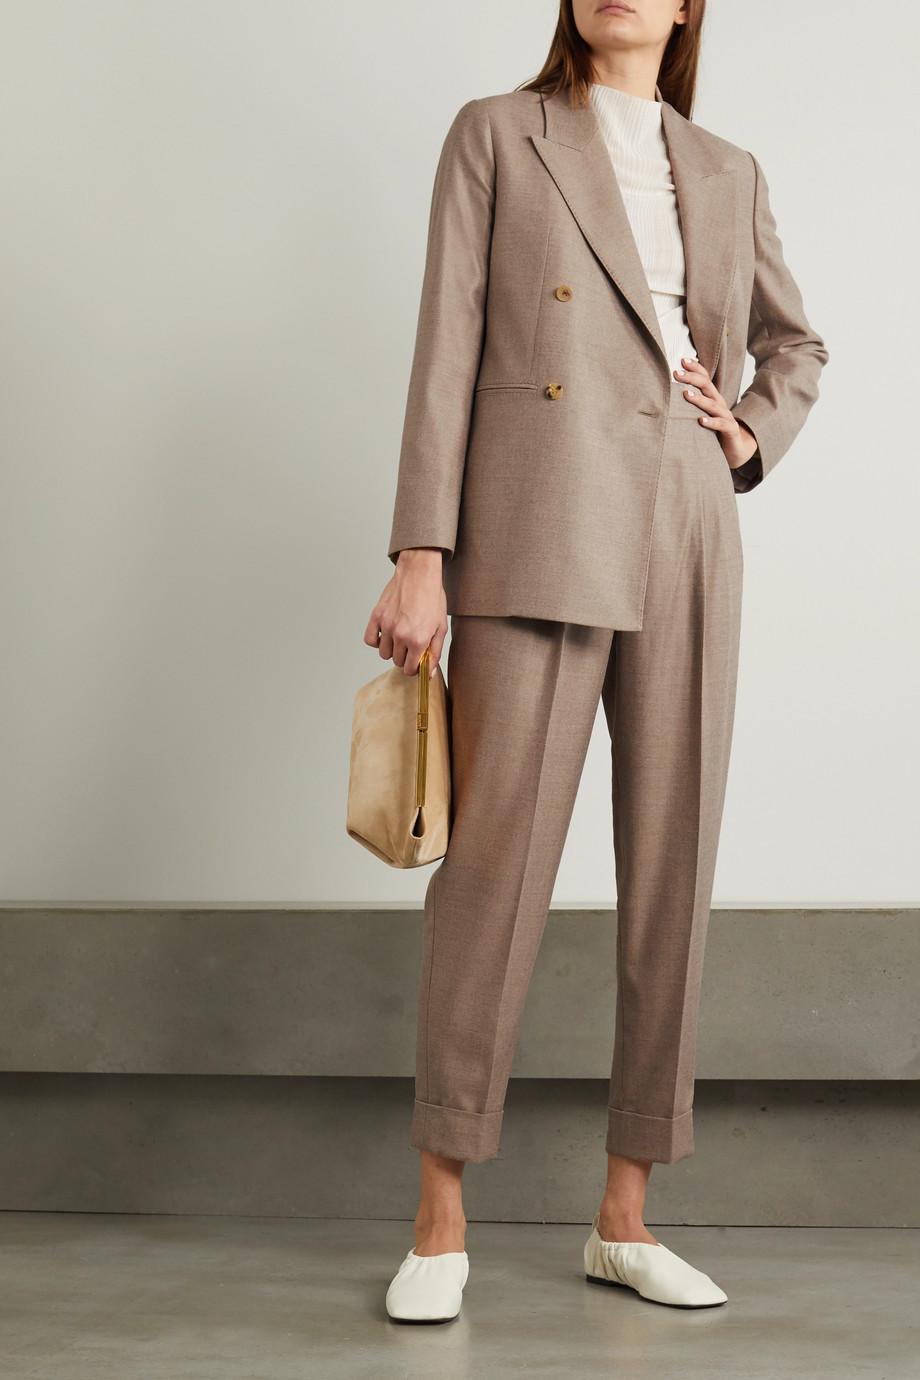 CASASOLA + NET SUSTAIN Leblon wool and silk-blend straight-leg pants